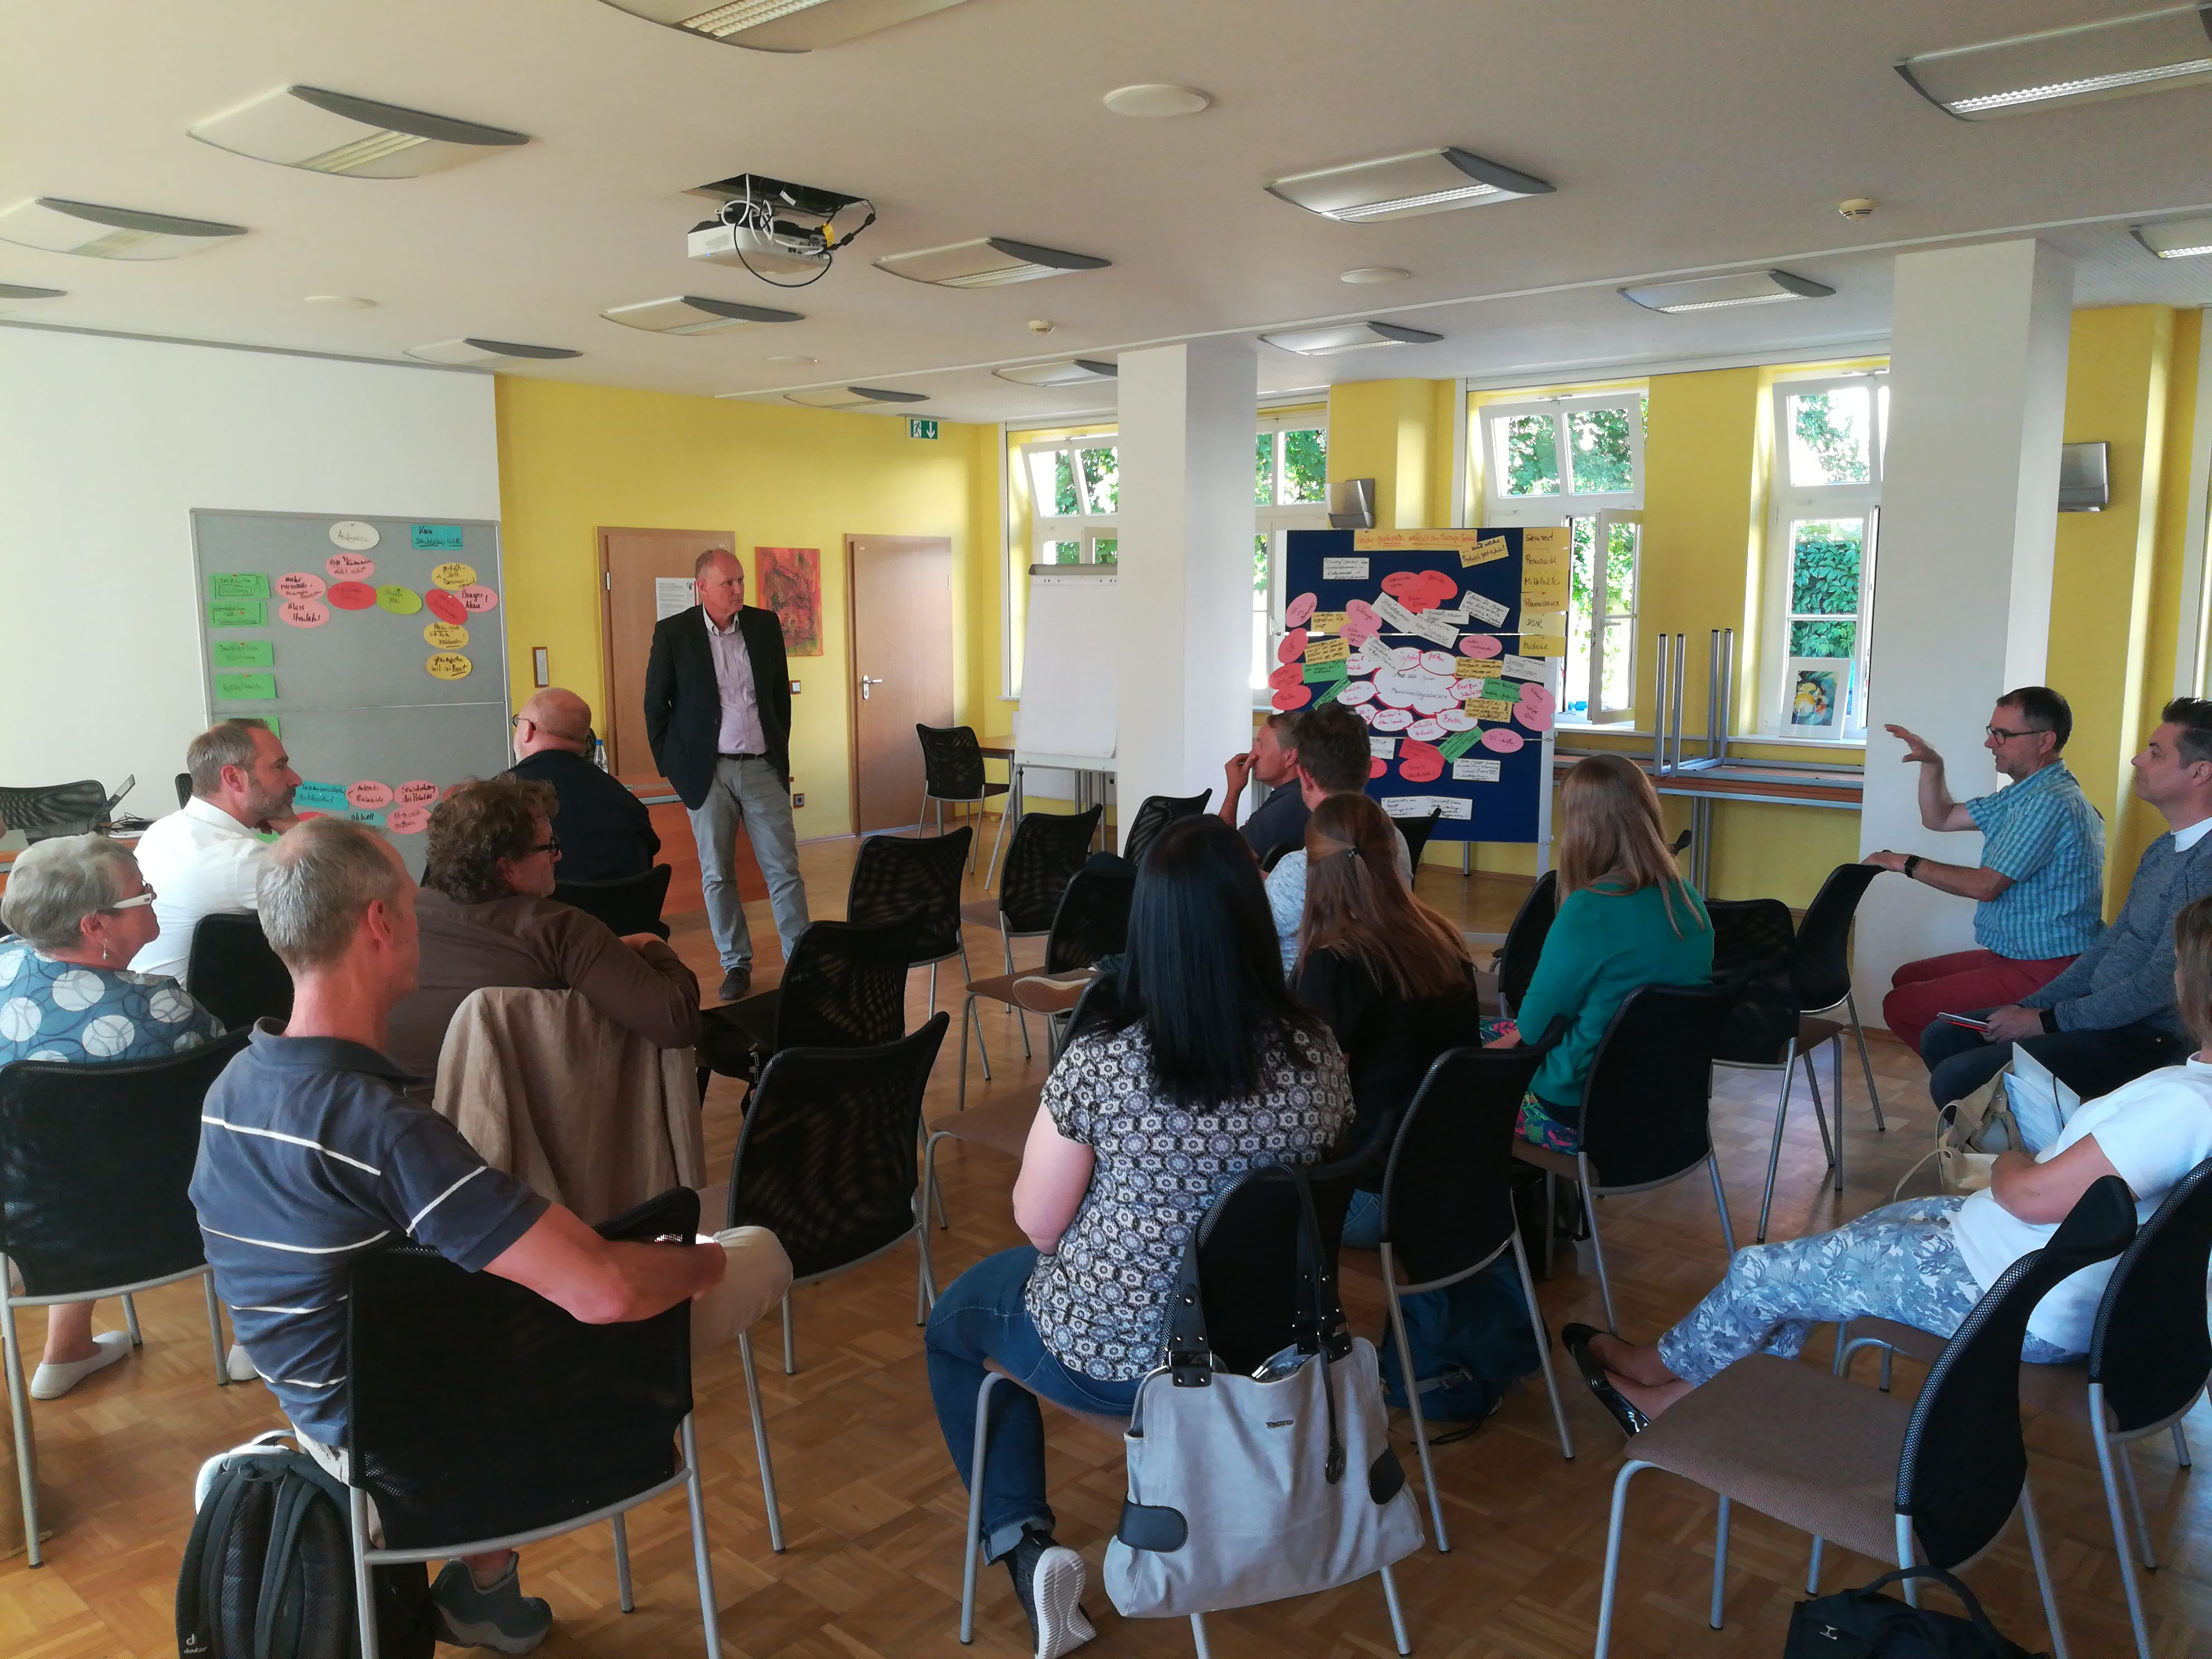 SÖM RAG_Tourismuskonzept Workshop_2019-07-03 (1).jpg, Foto: Nicolas Ruge